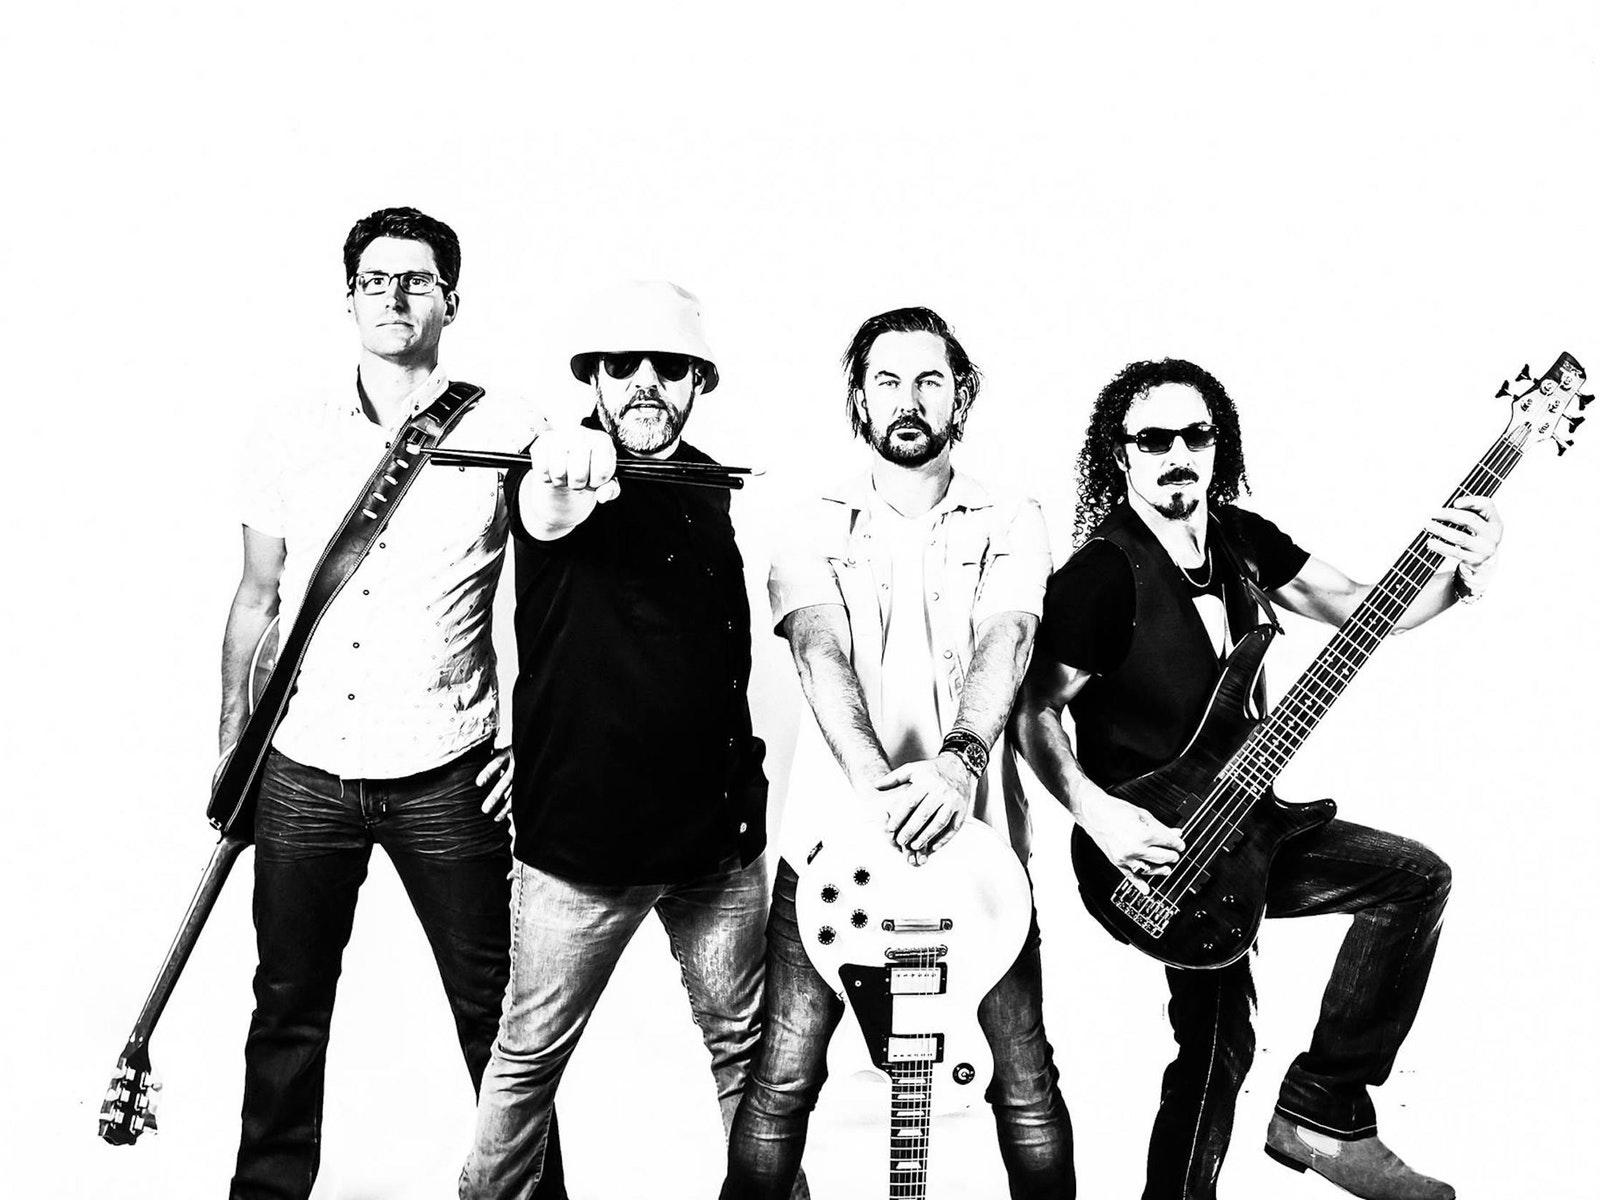 Mr Meaner - Free live music Apollo Bay